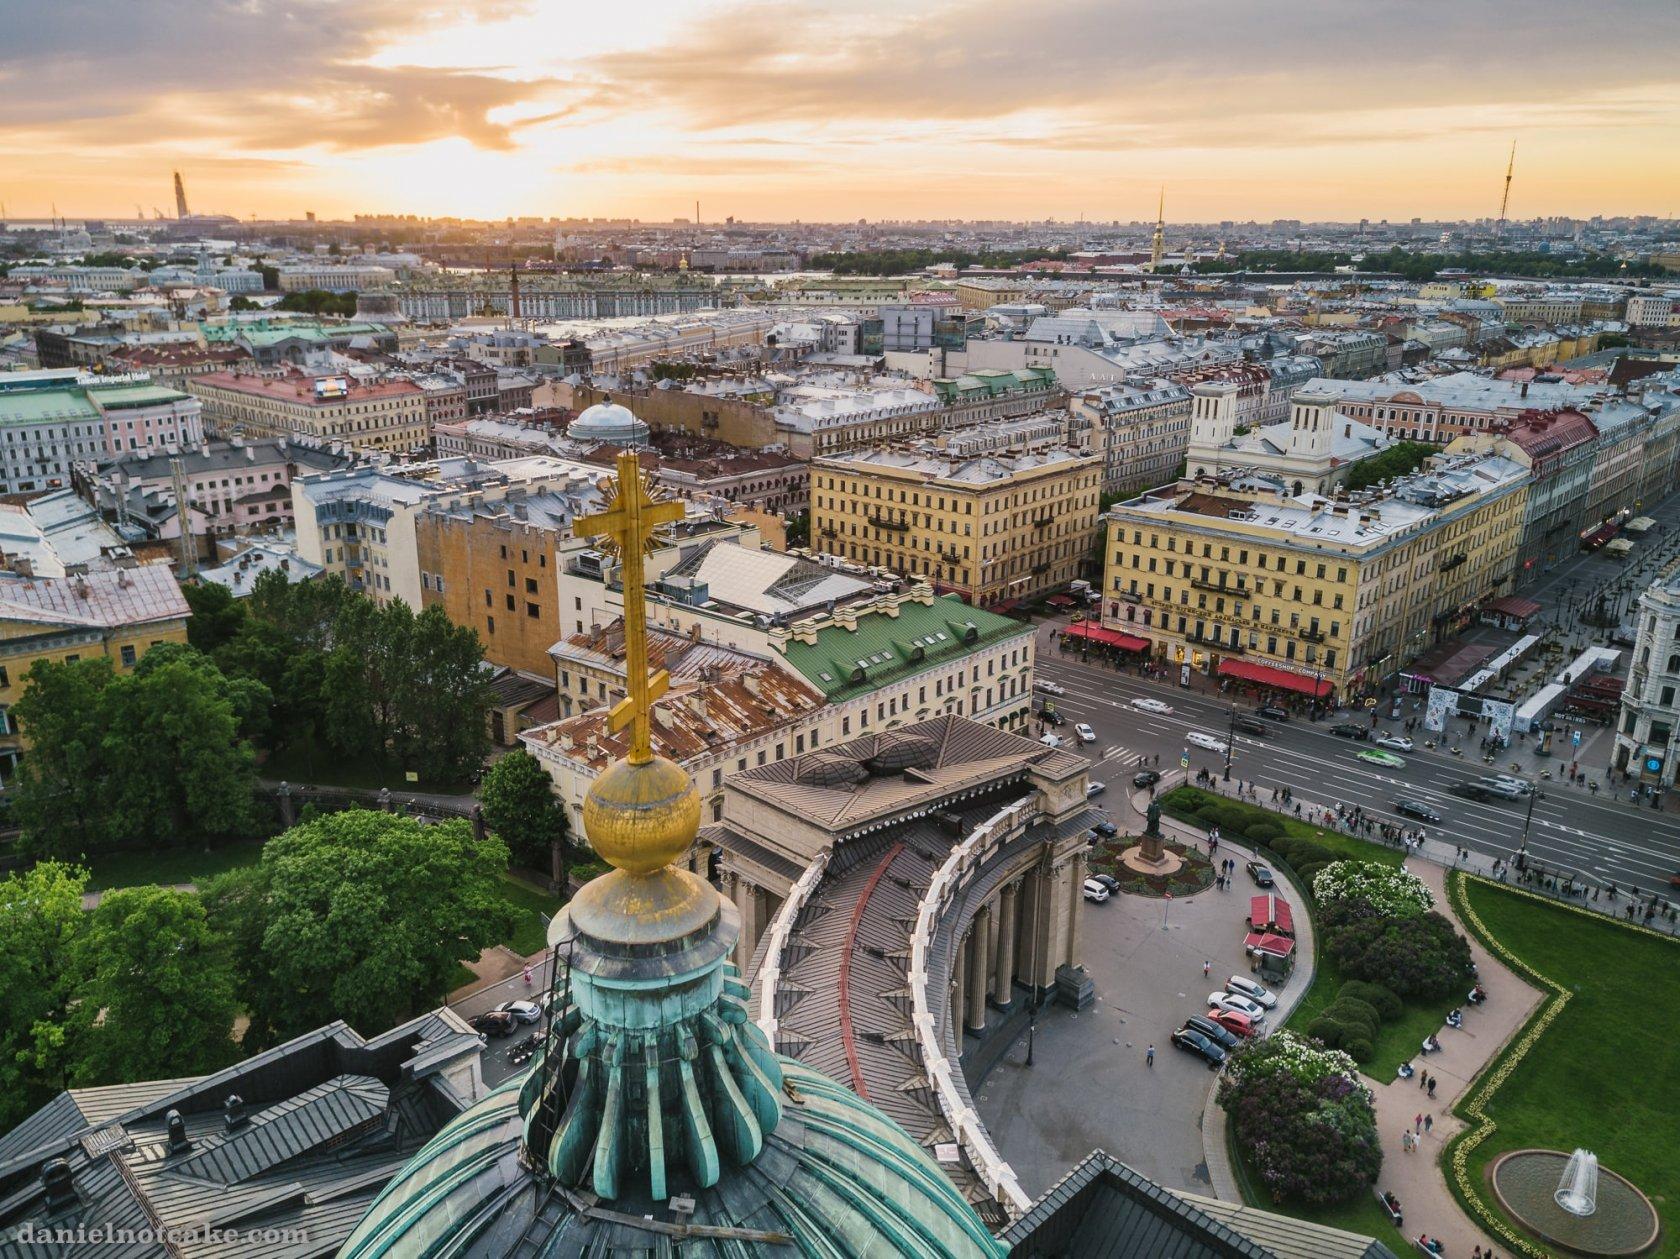 исторический центр санкт-петербурга картинка заподозрила парня